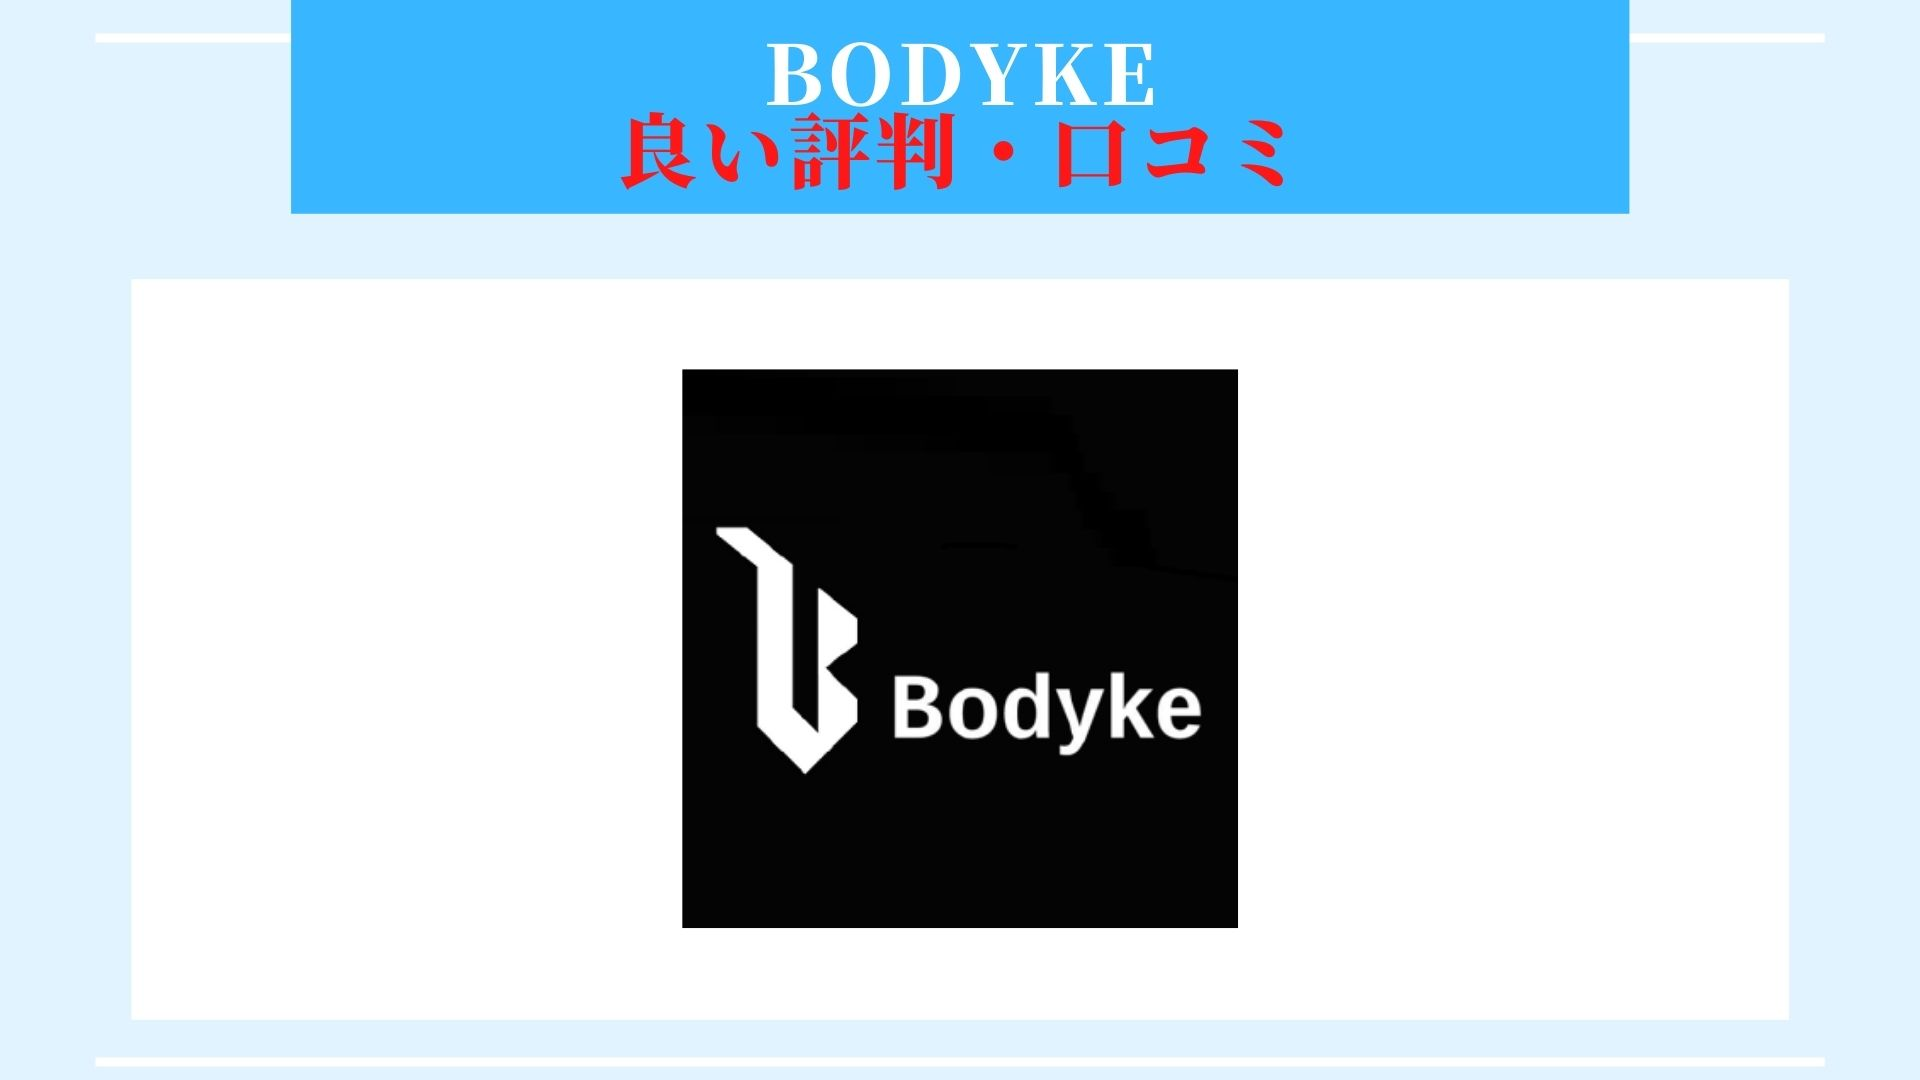 Bodyke